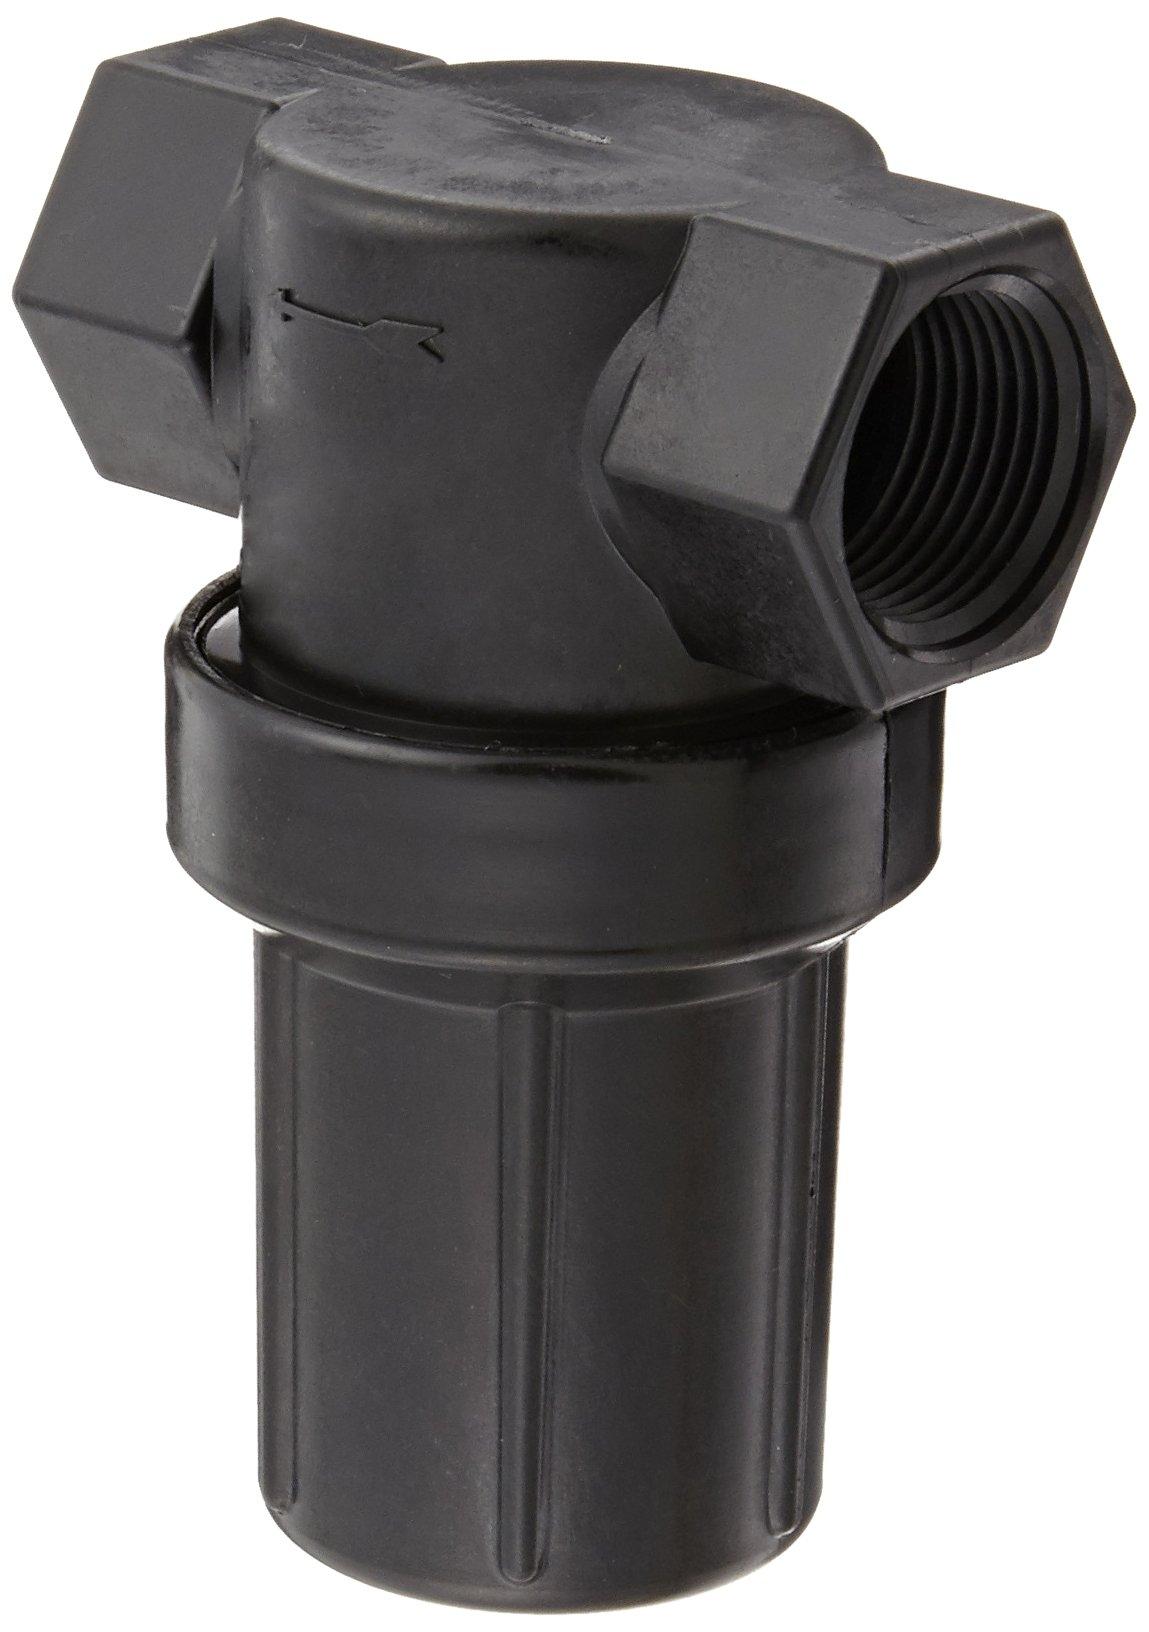 Banjo LSTM075-30 Polypropylene Mini T-Strainer with Black Bowl, 30 Mesh, 3/4'' NPT Female